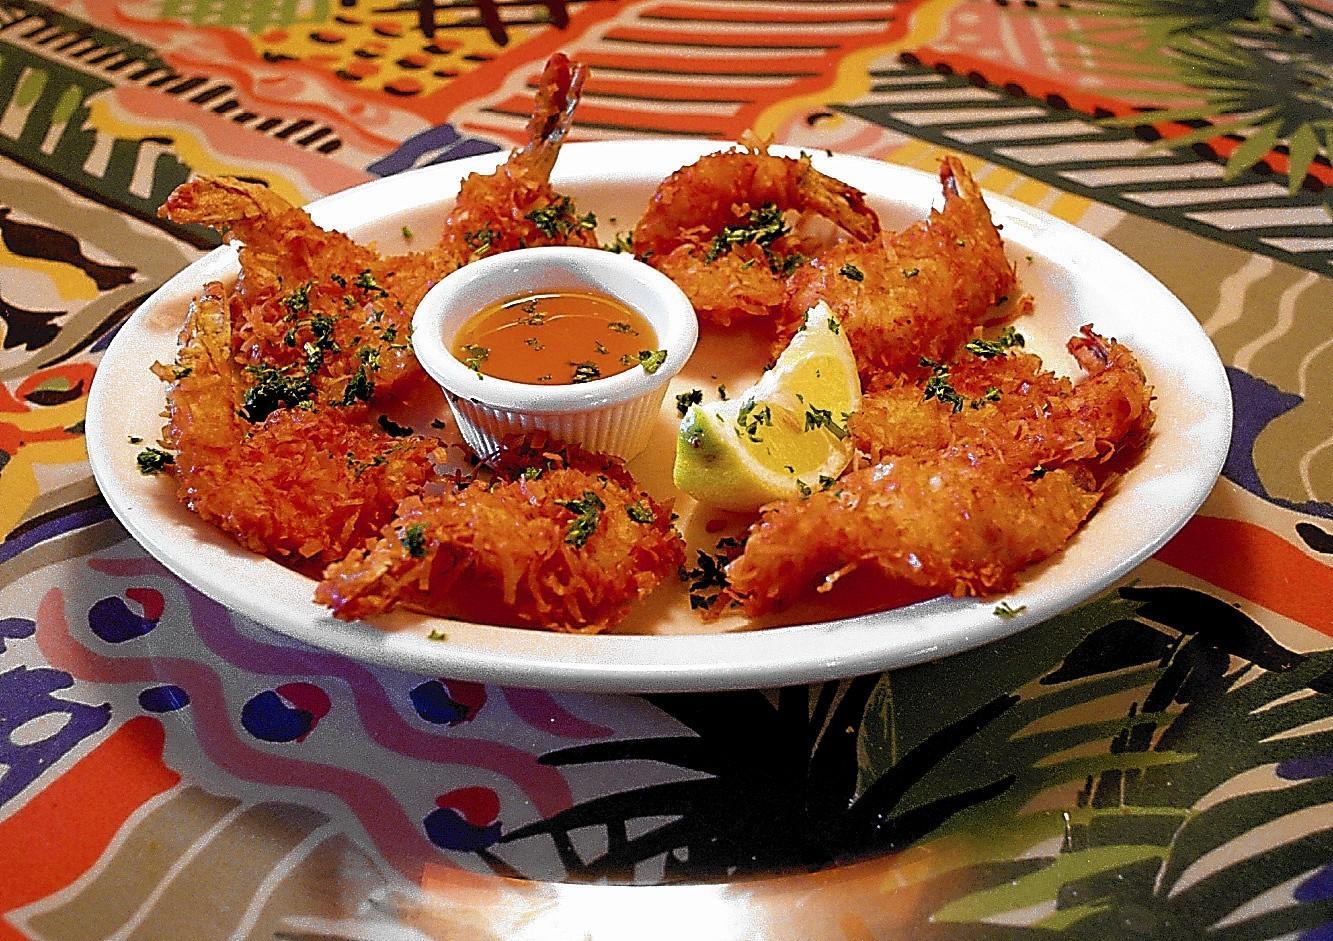 Coconut shrimp was a popular menu item at Straub's Seafood.